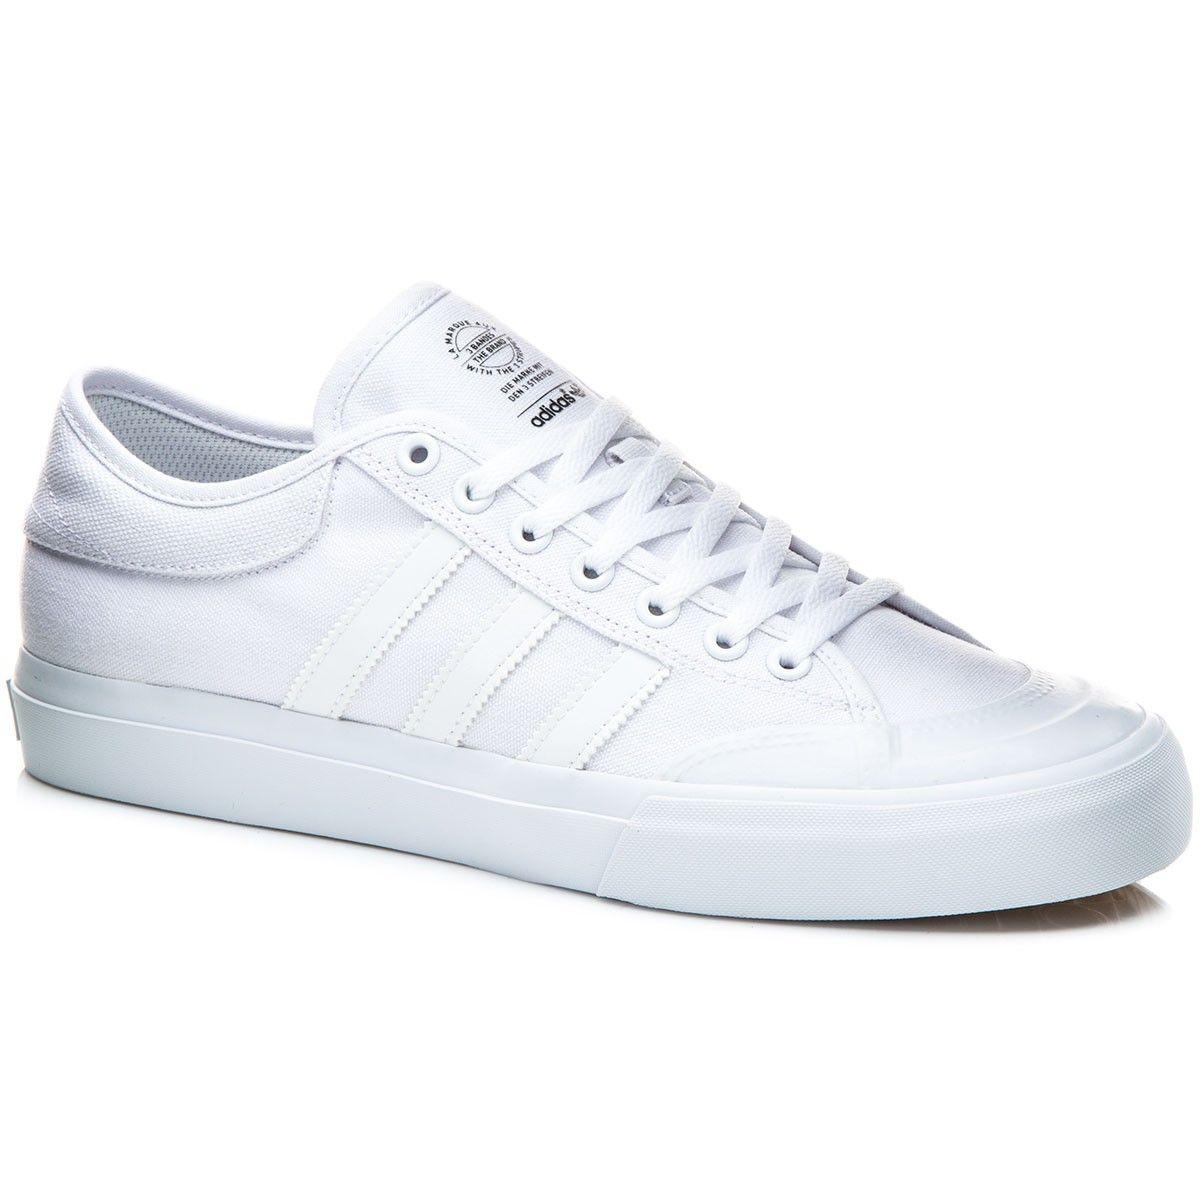 San Francisco b0f7d 71994 Adidas Matchcourt Shoes | Accessorize Me | Adidas, Adidas ...